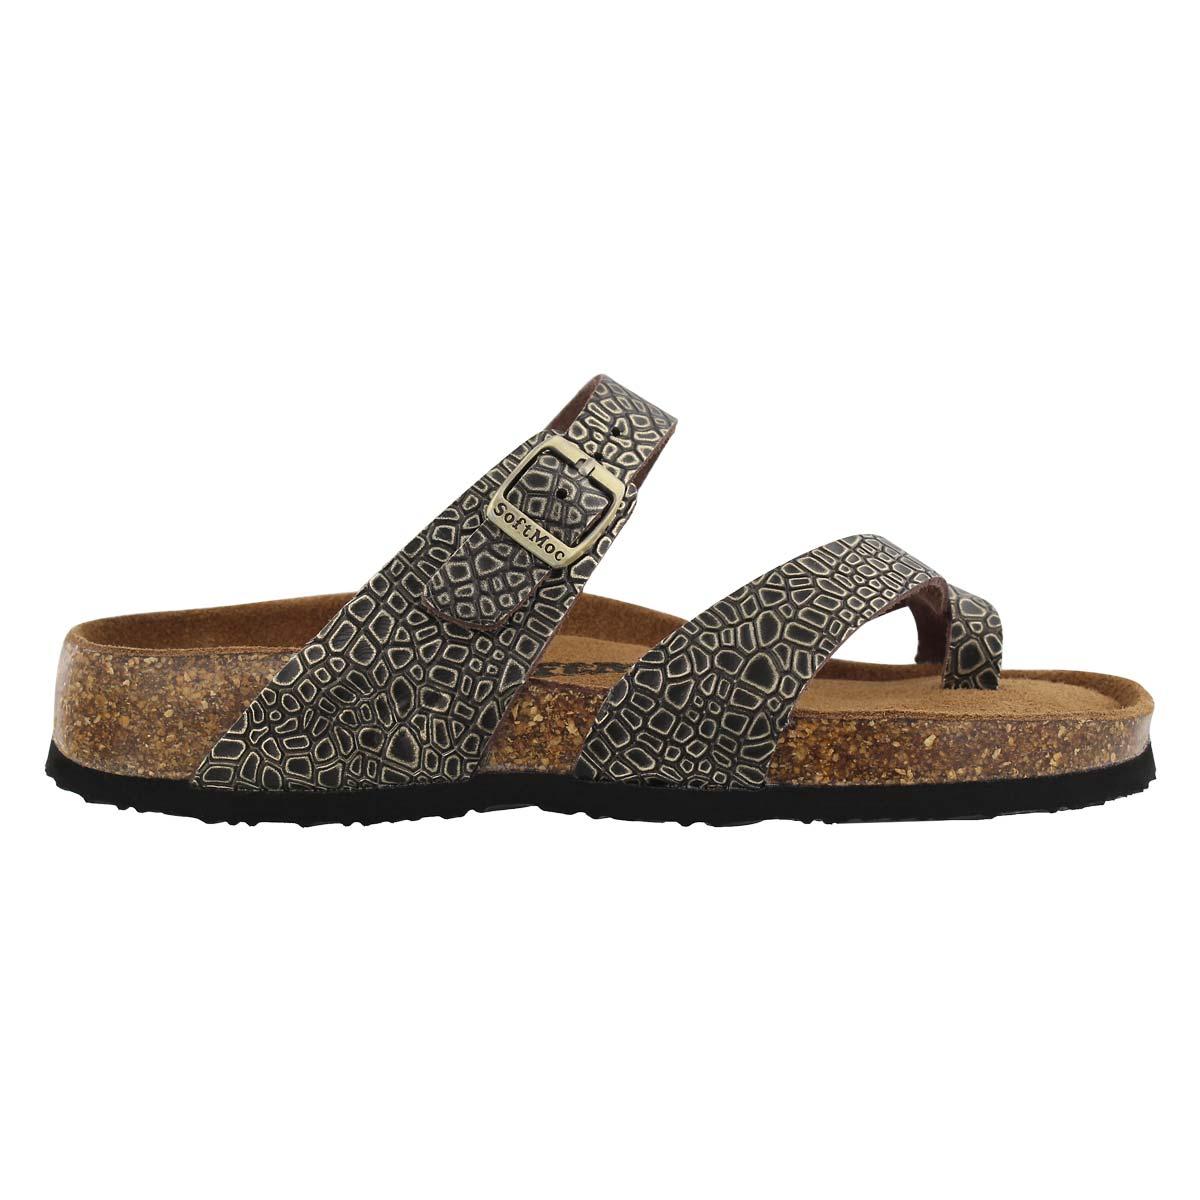 Lds Alicia 5 gld emb memory foam sandal